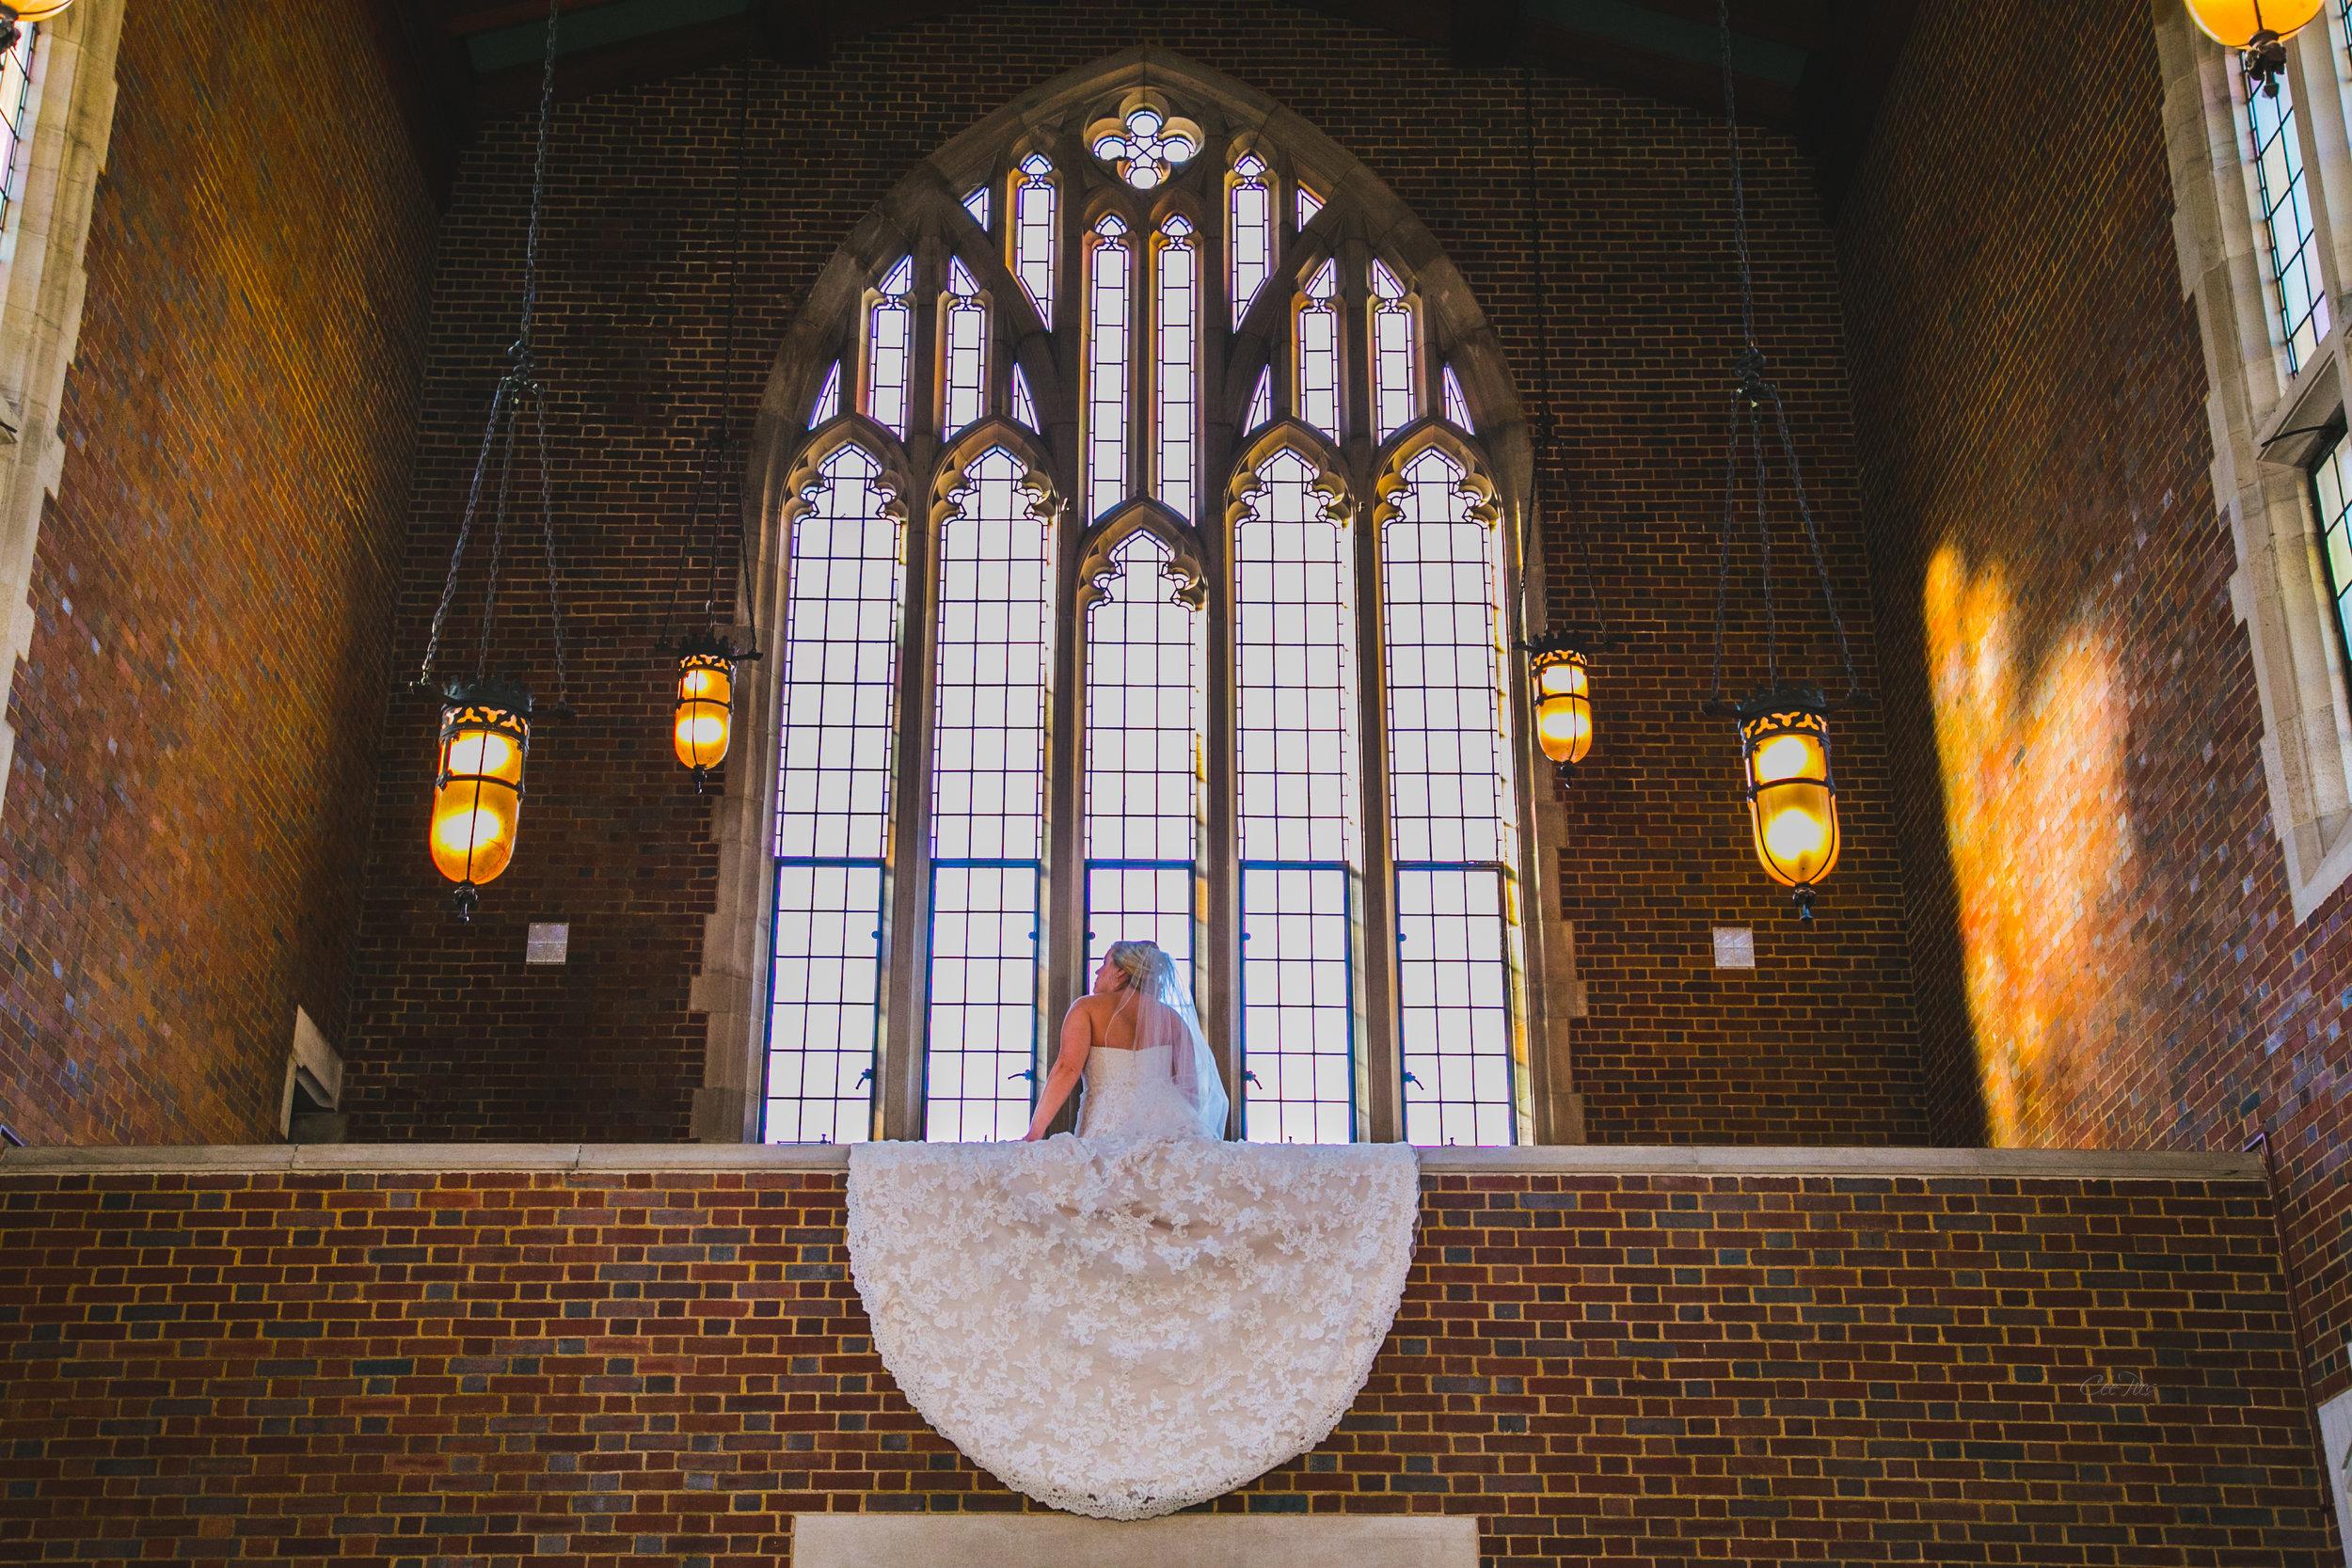 Nashville_Wedding_Photographer_Photography_DJ_MC_Lighting_Photobooth_Franklin_Bowling_Gallatin3-15.jpg